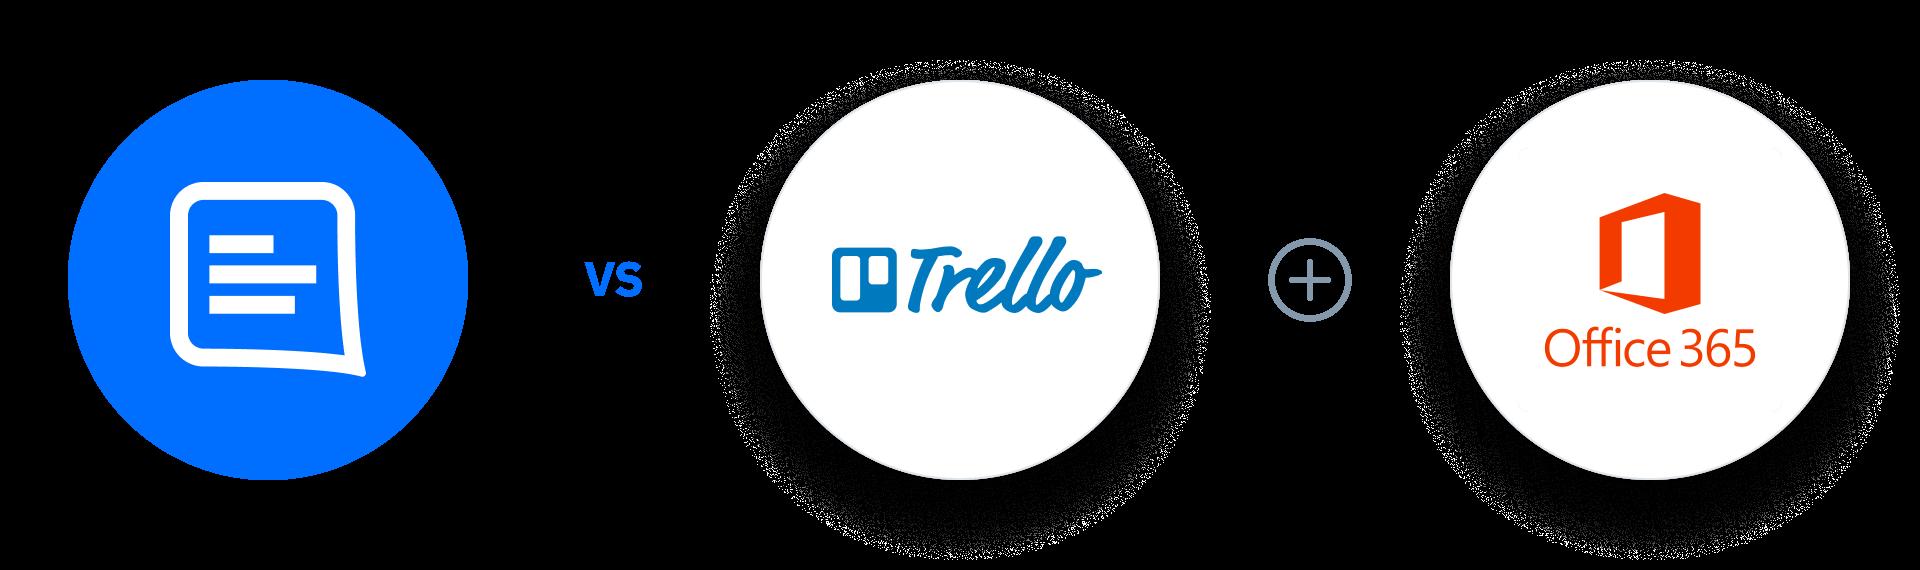 GC Vs Trello + Office 365